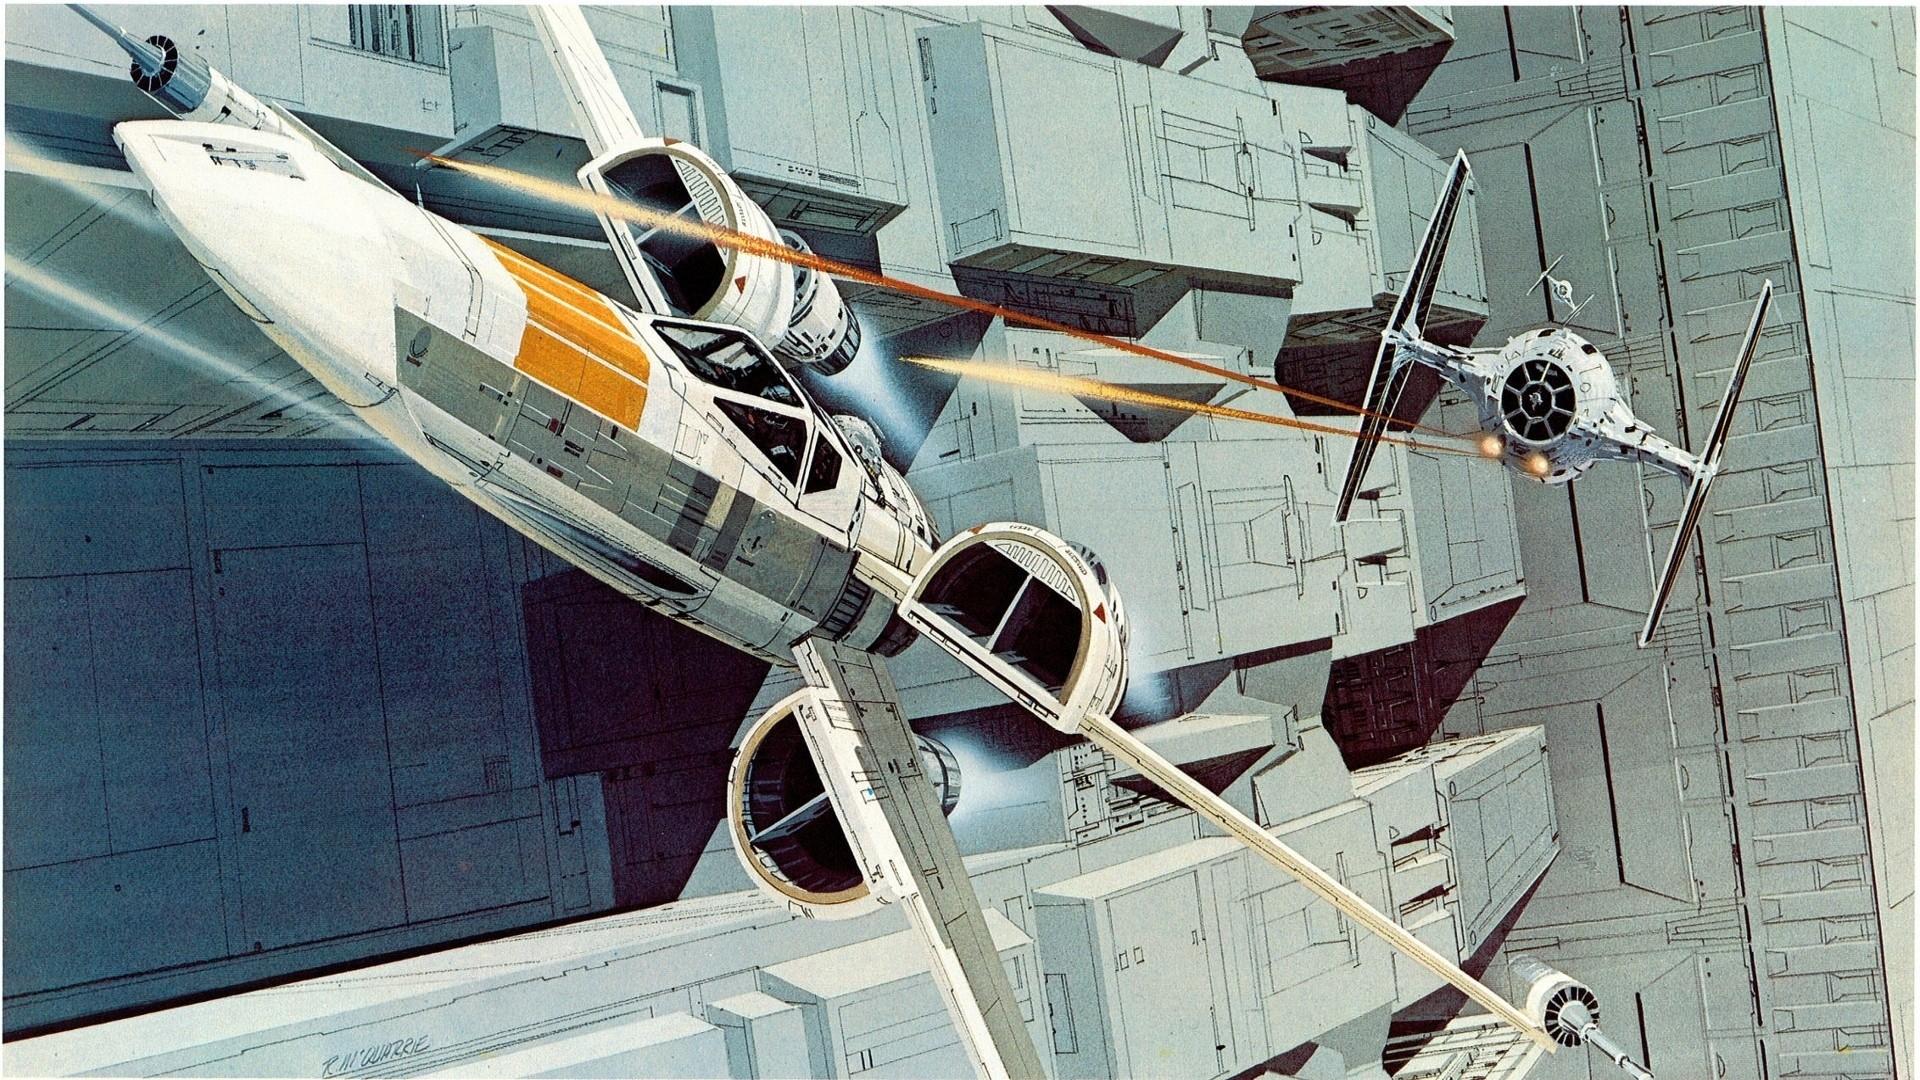 32 best Star Wars/1977 images on Pinterest   Star wars art, Ralph mcquarrie  and Star wars concept art